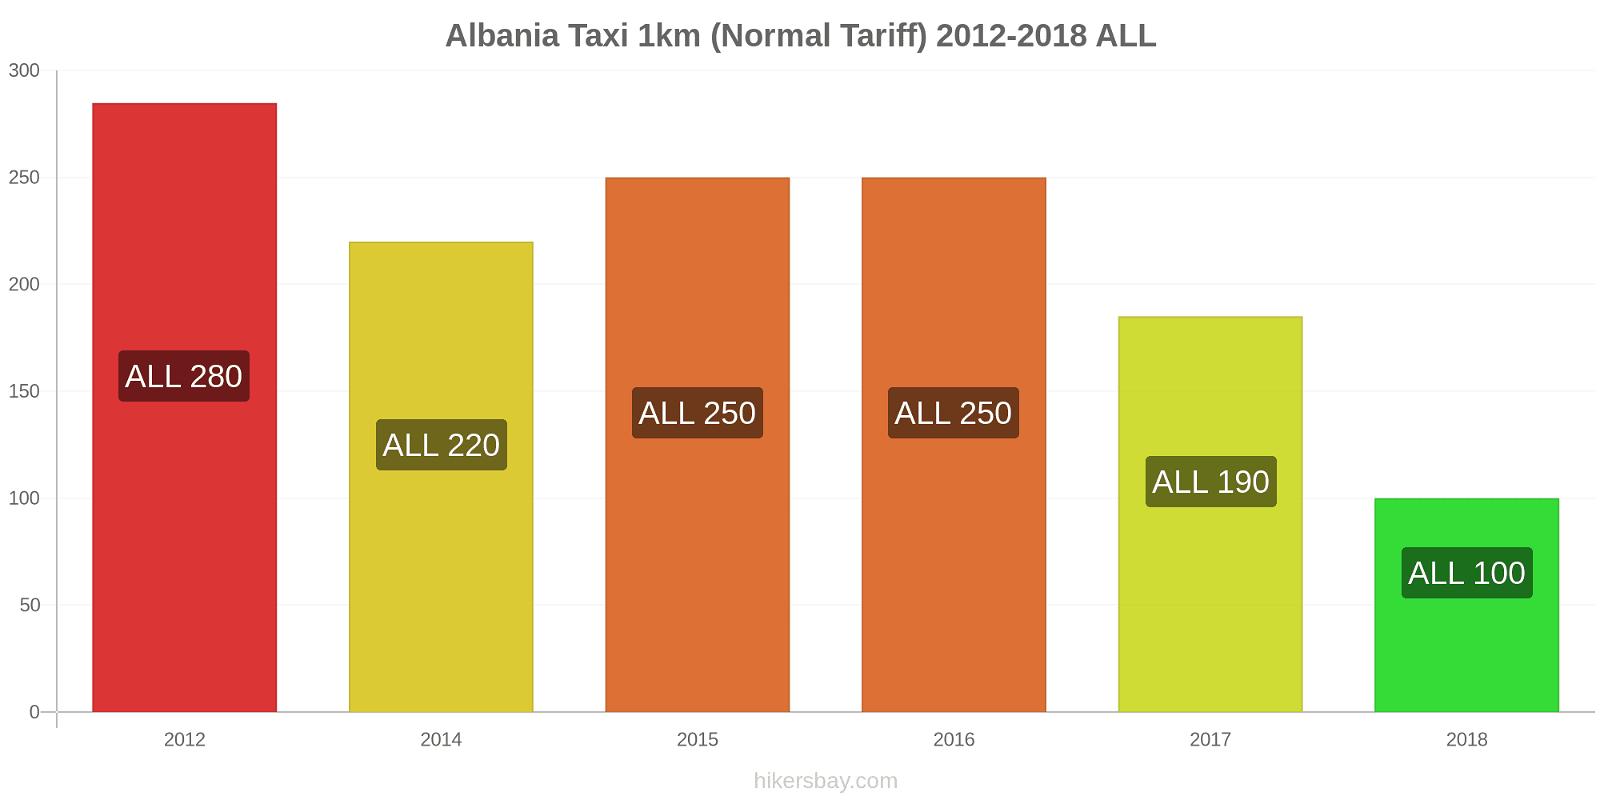 Albania price changes Taxi 1km (Normal Tariff) hikersbay.com